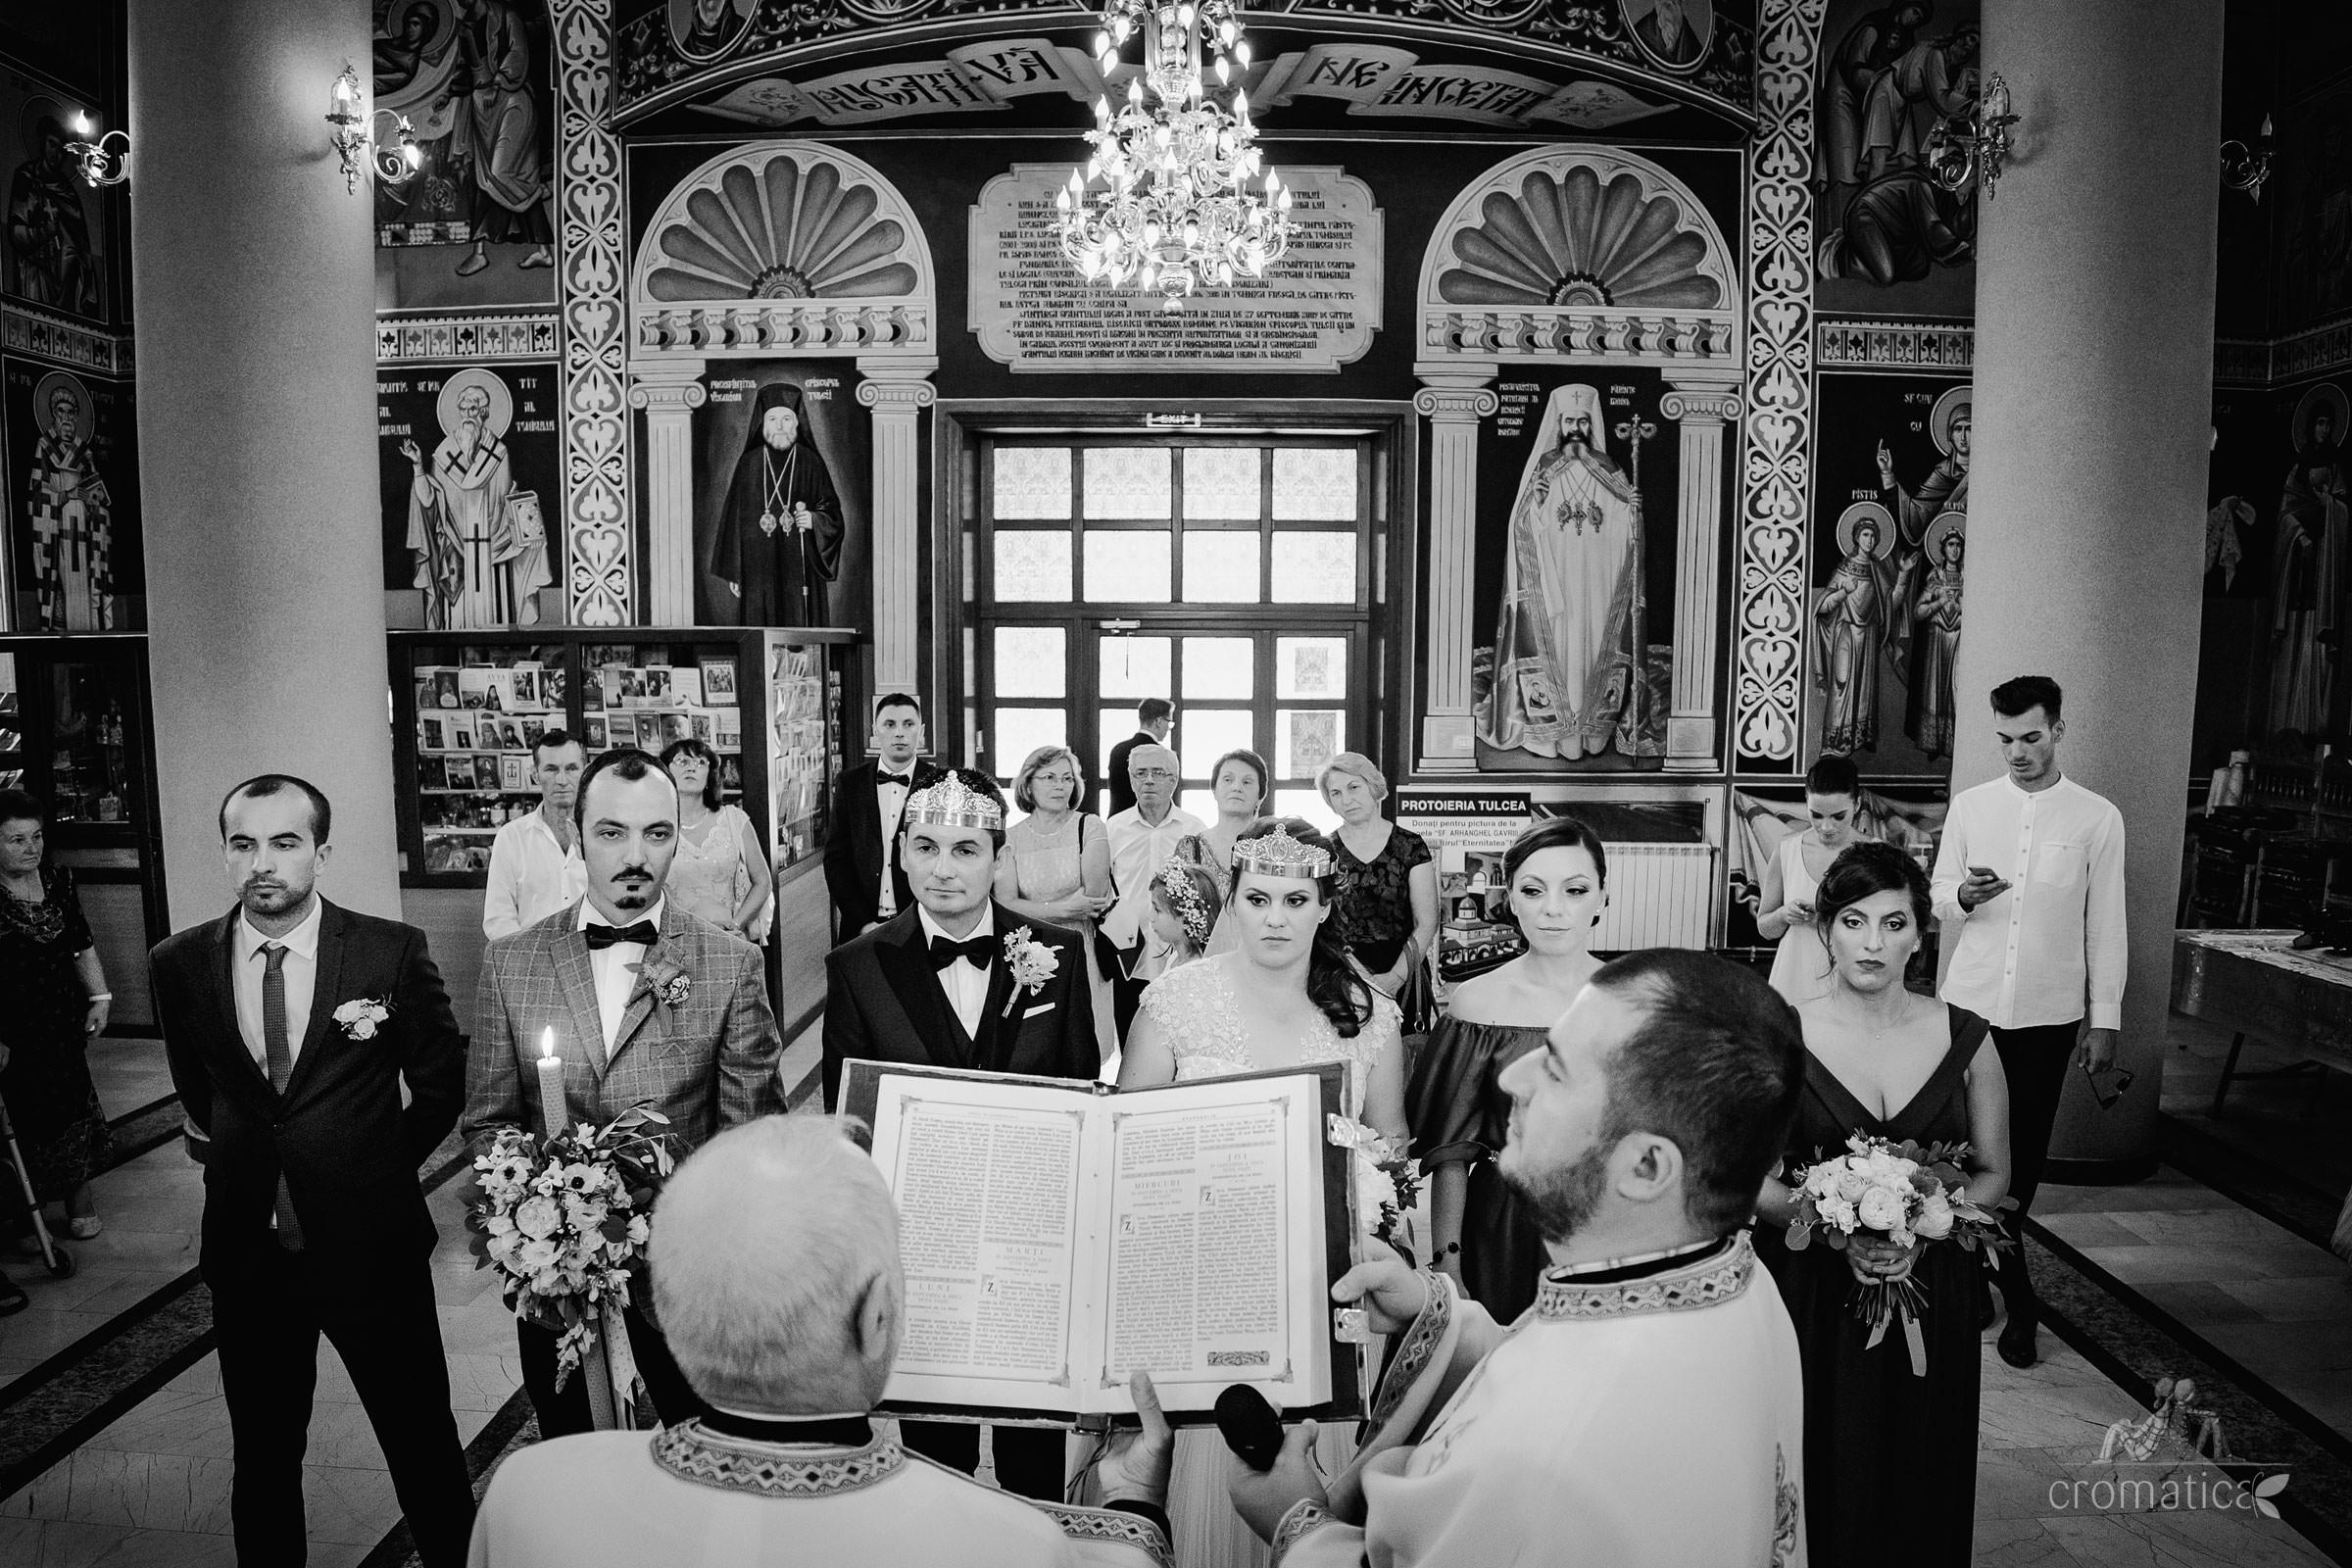 giorgiana constantin fotografii nunta delta royal delta dunarii 037